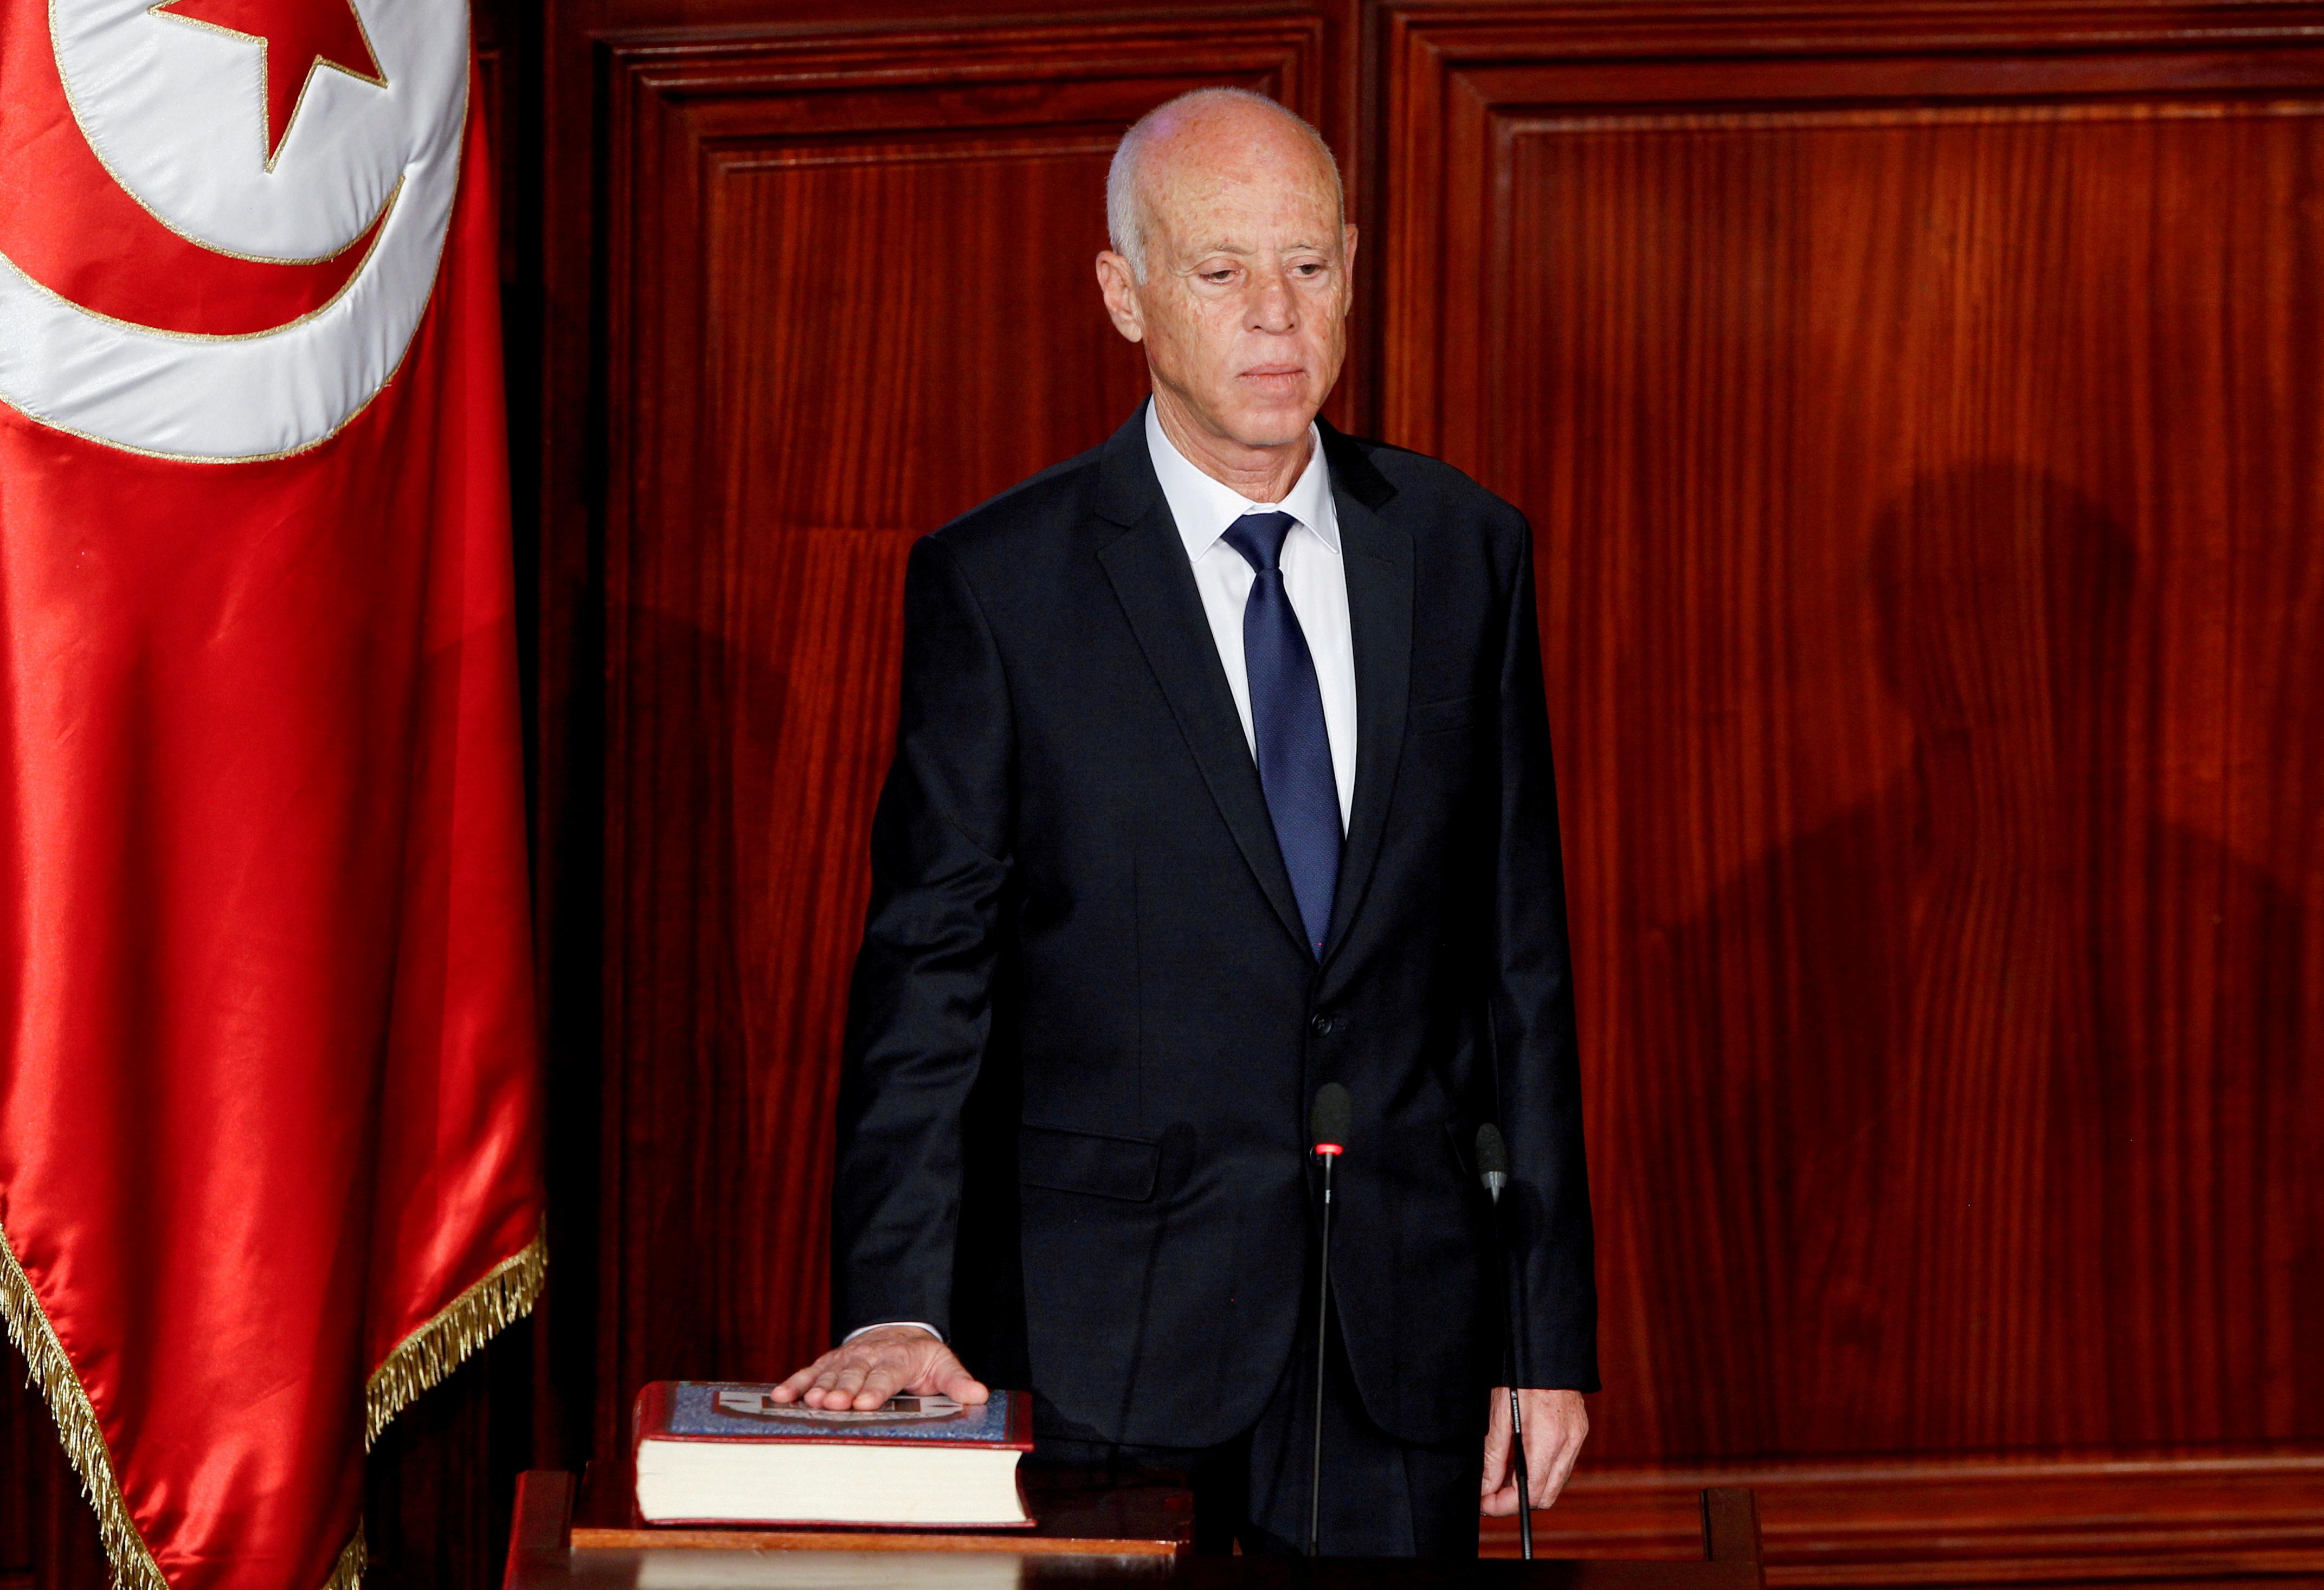 Tunisian President Kais Saied takes the oath of office in Tunis, Tunisia, October 23, 2019. REUTERS/Zoubeir Souiss/File Photo